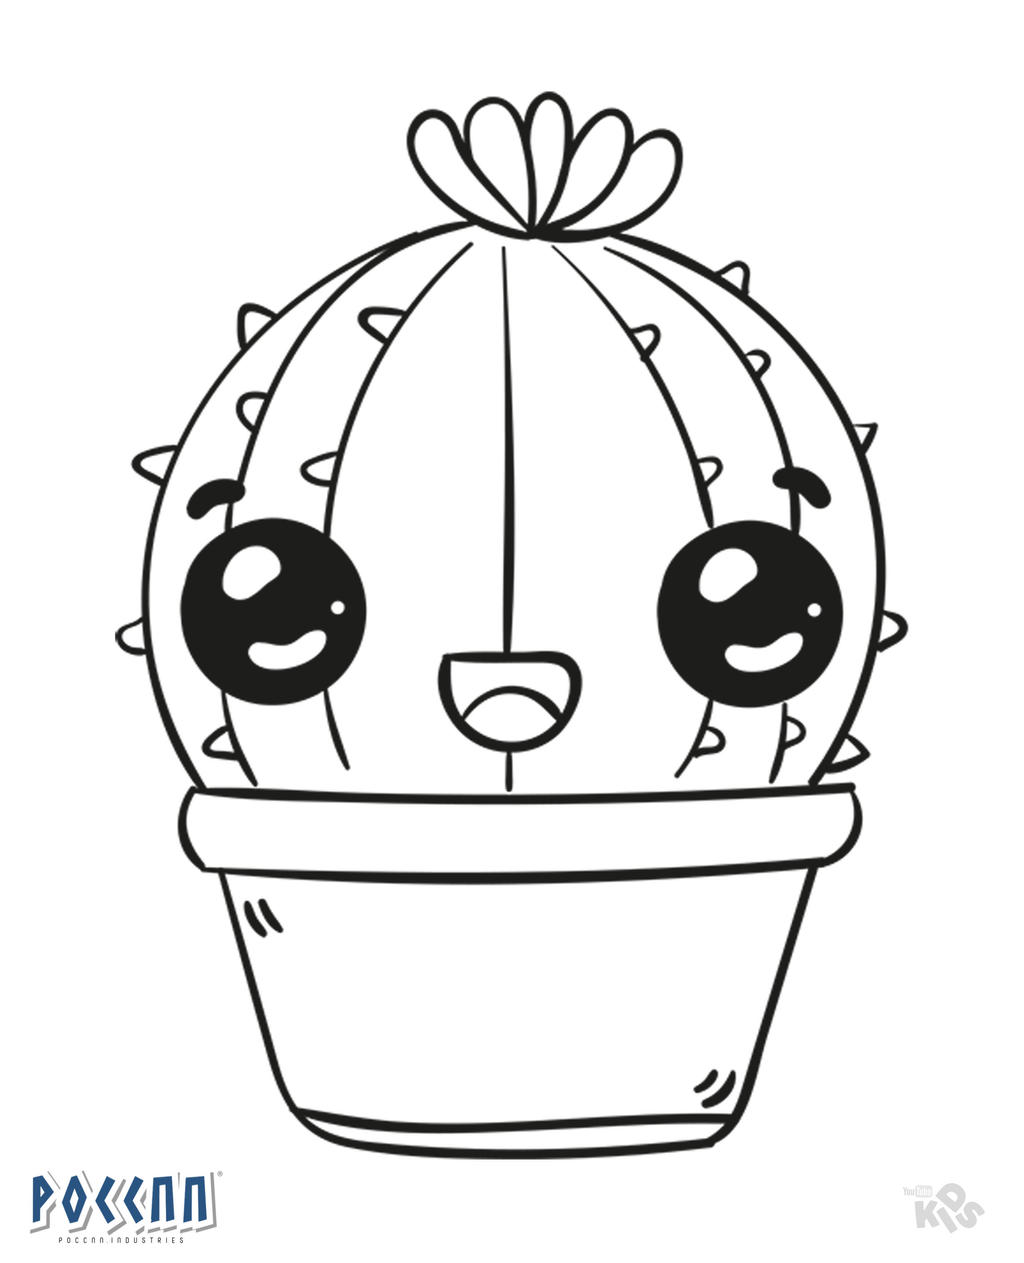 Hedgehog Cactus Kawaii To Color Lineart By